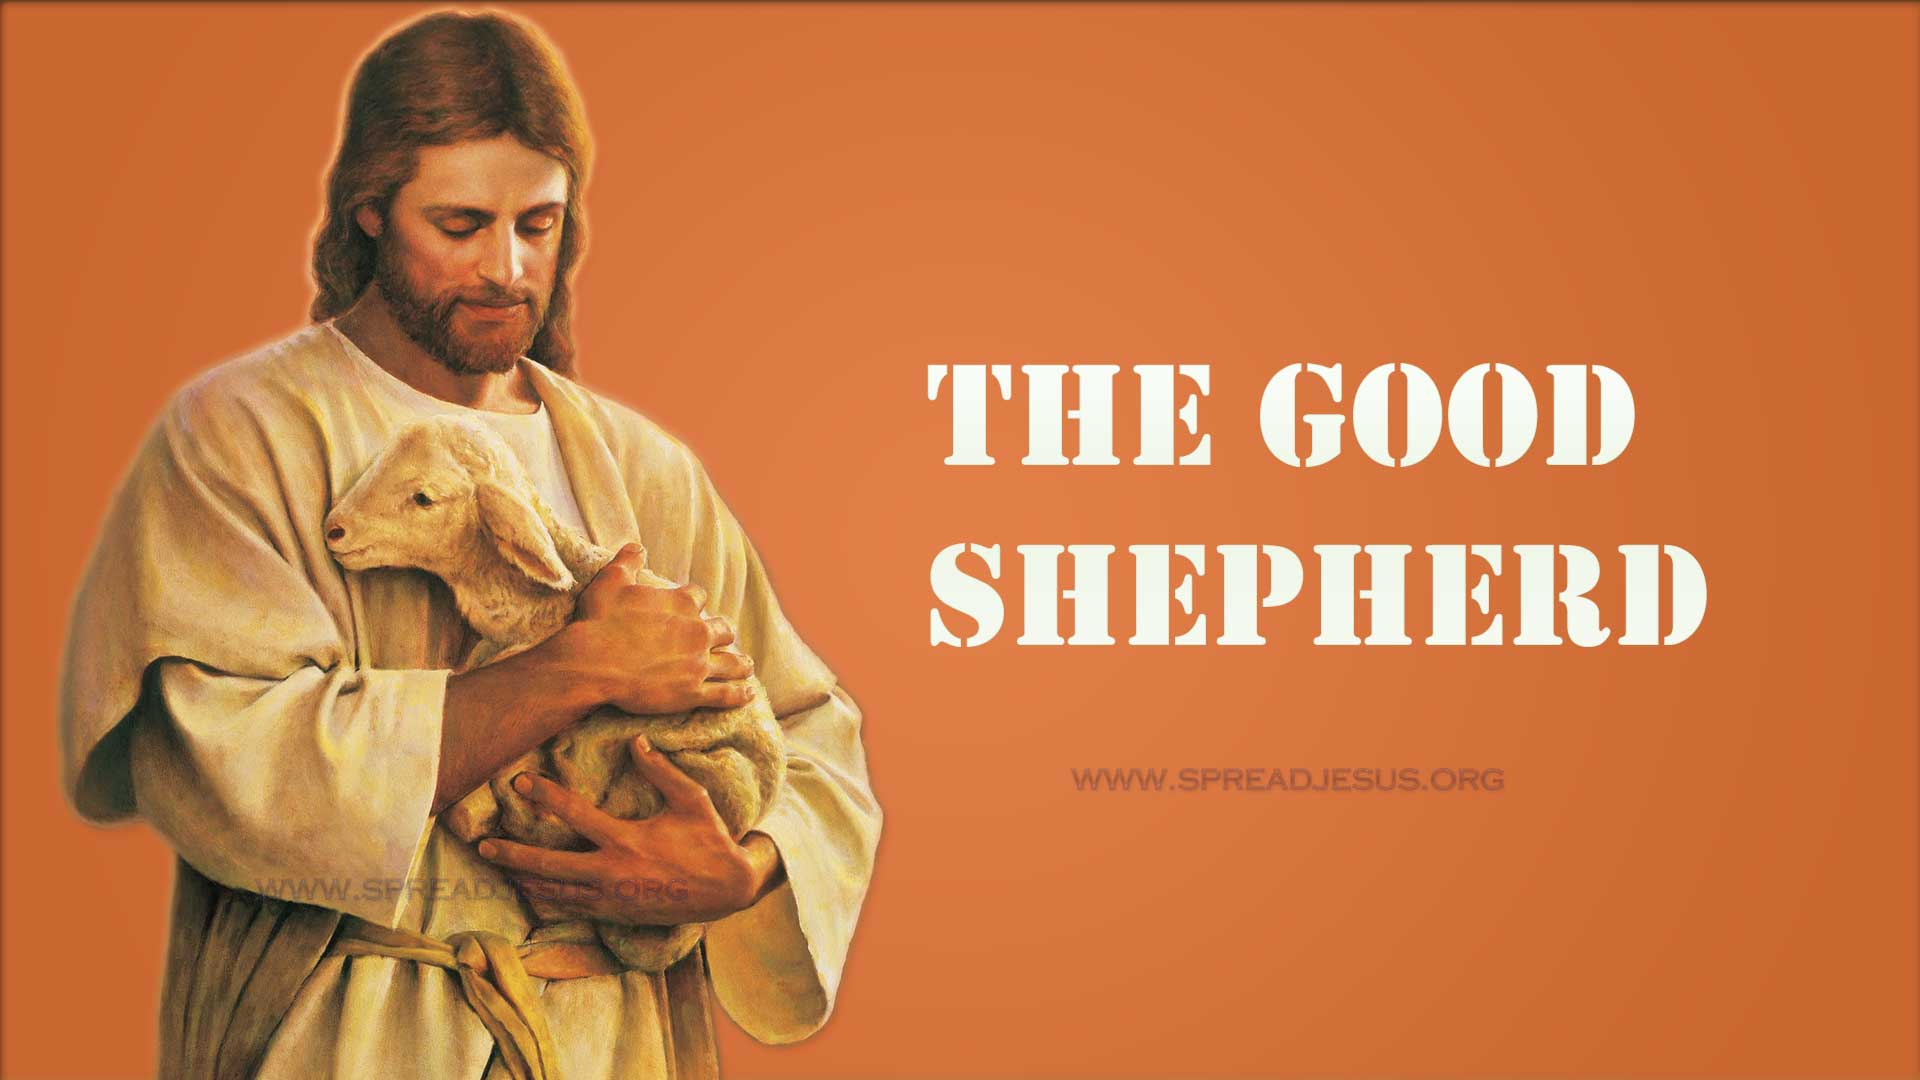 The Good Shepherd wallpapers